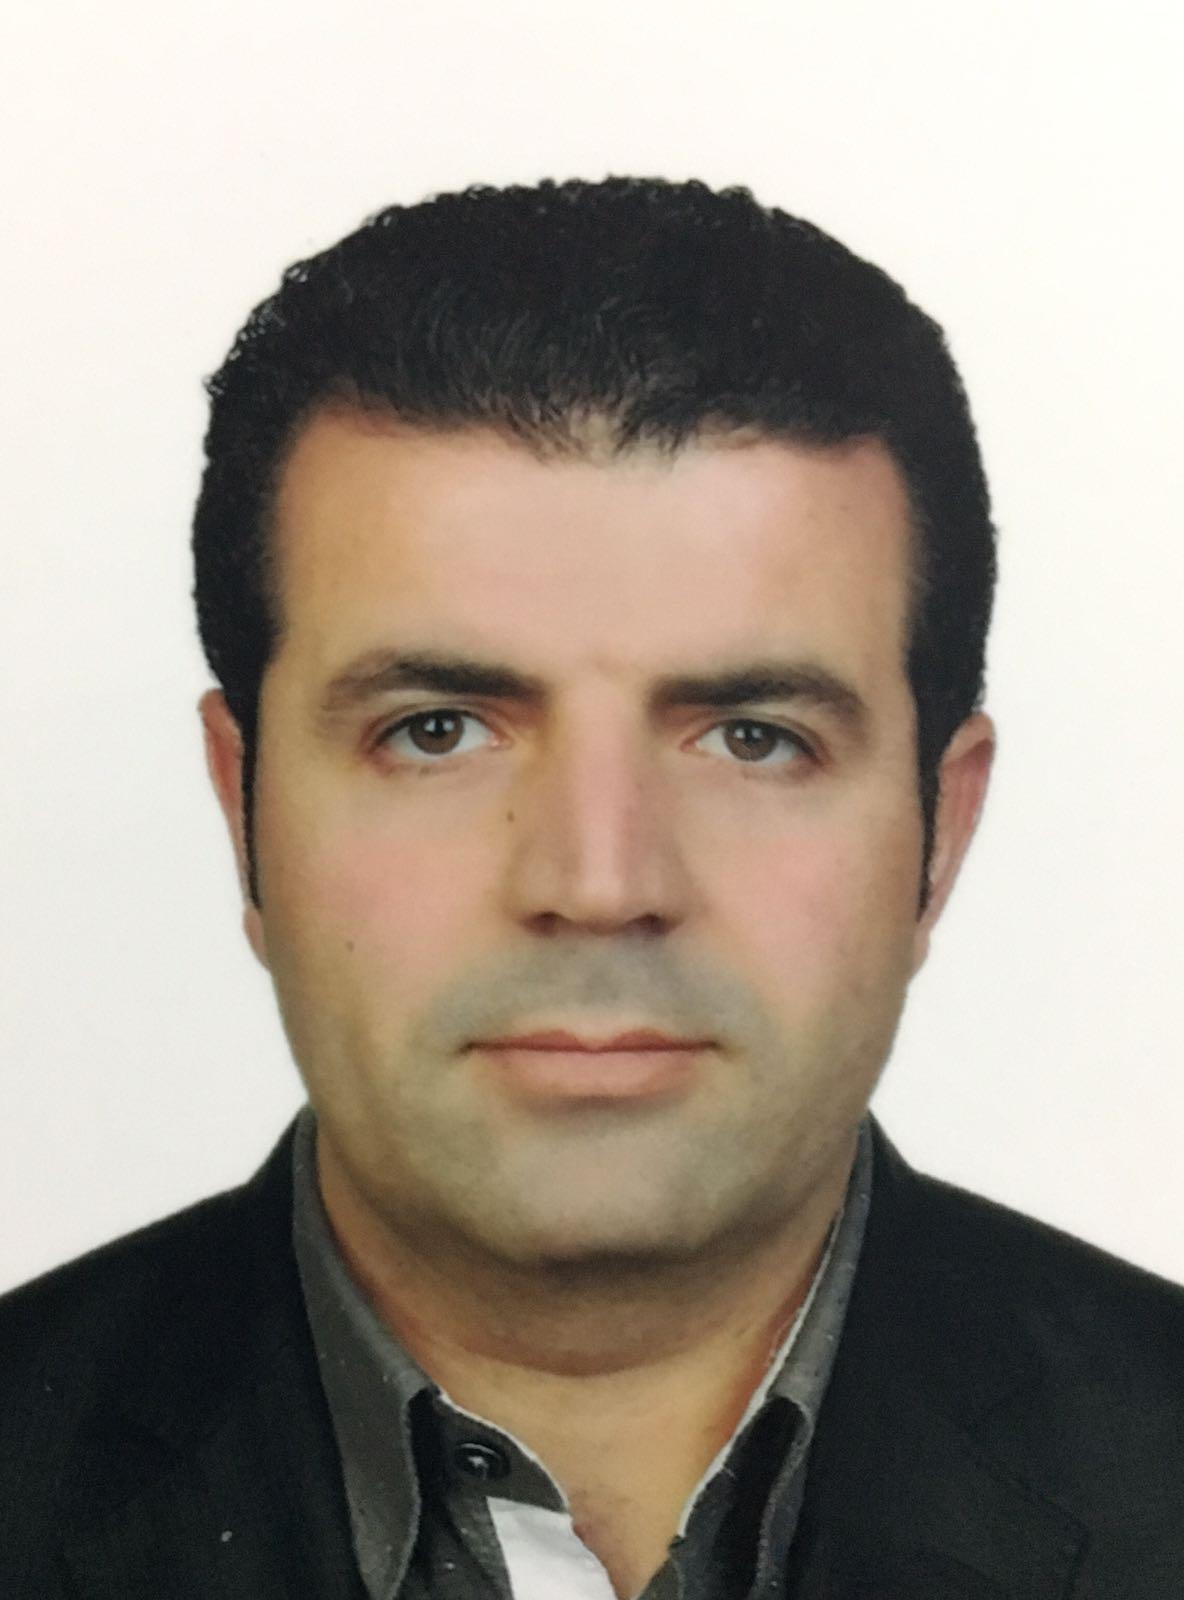 Soyan Karagöz